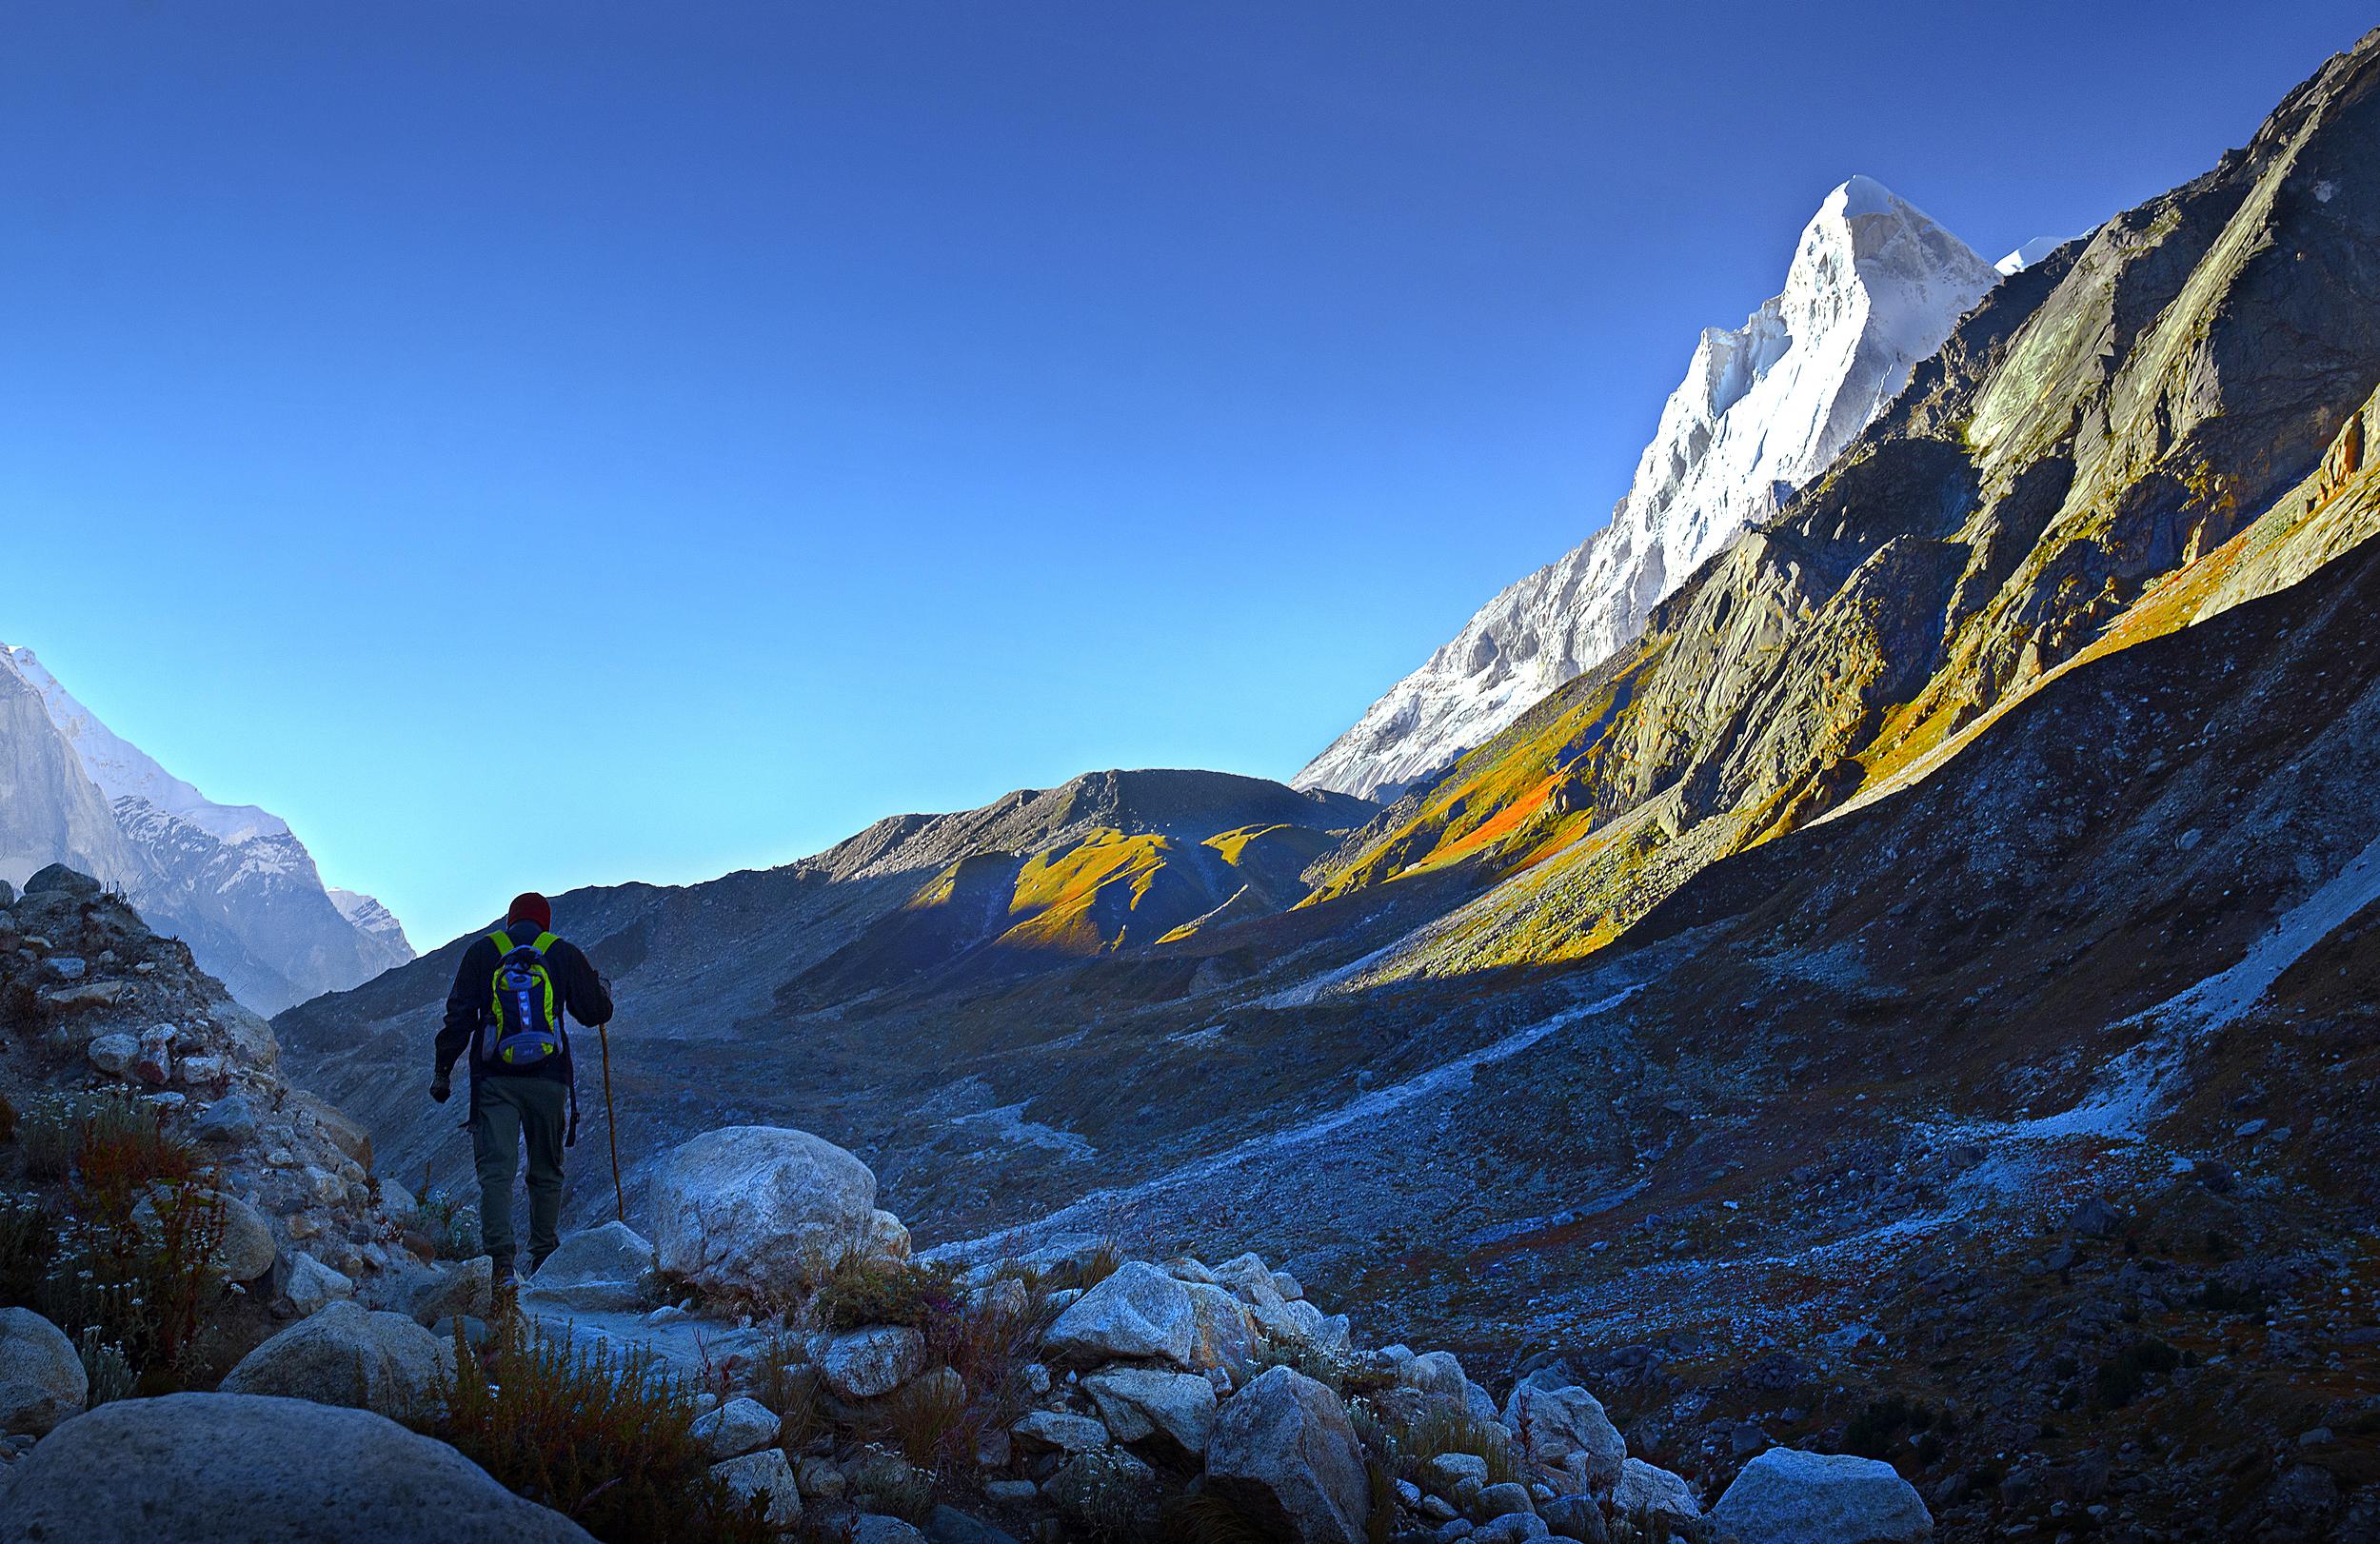 A Man Walking Towards the Mountain